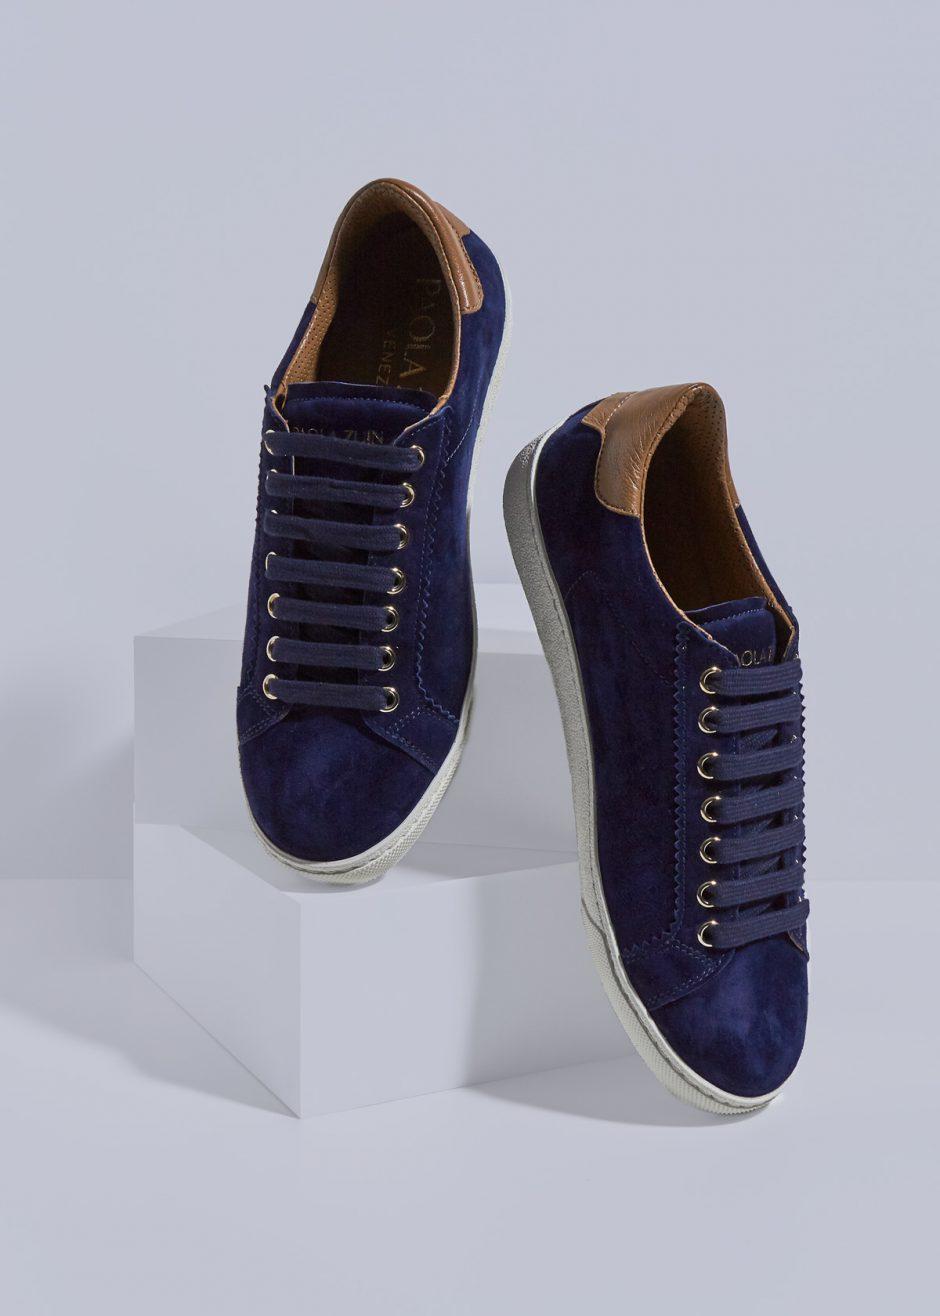 Jackie – Sneakers in pelle suede effetto cachemire blu